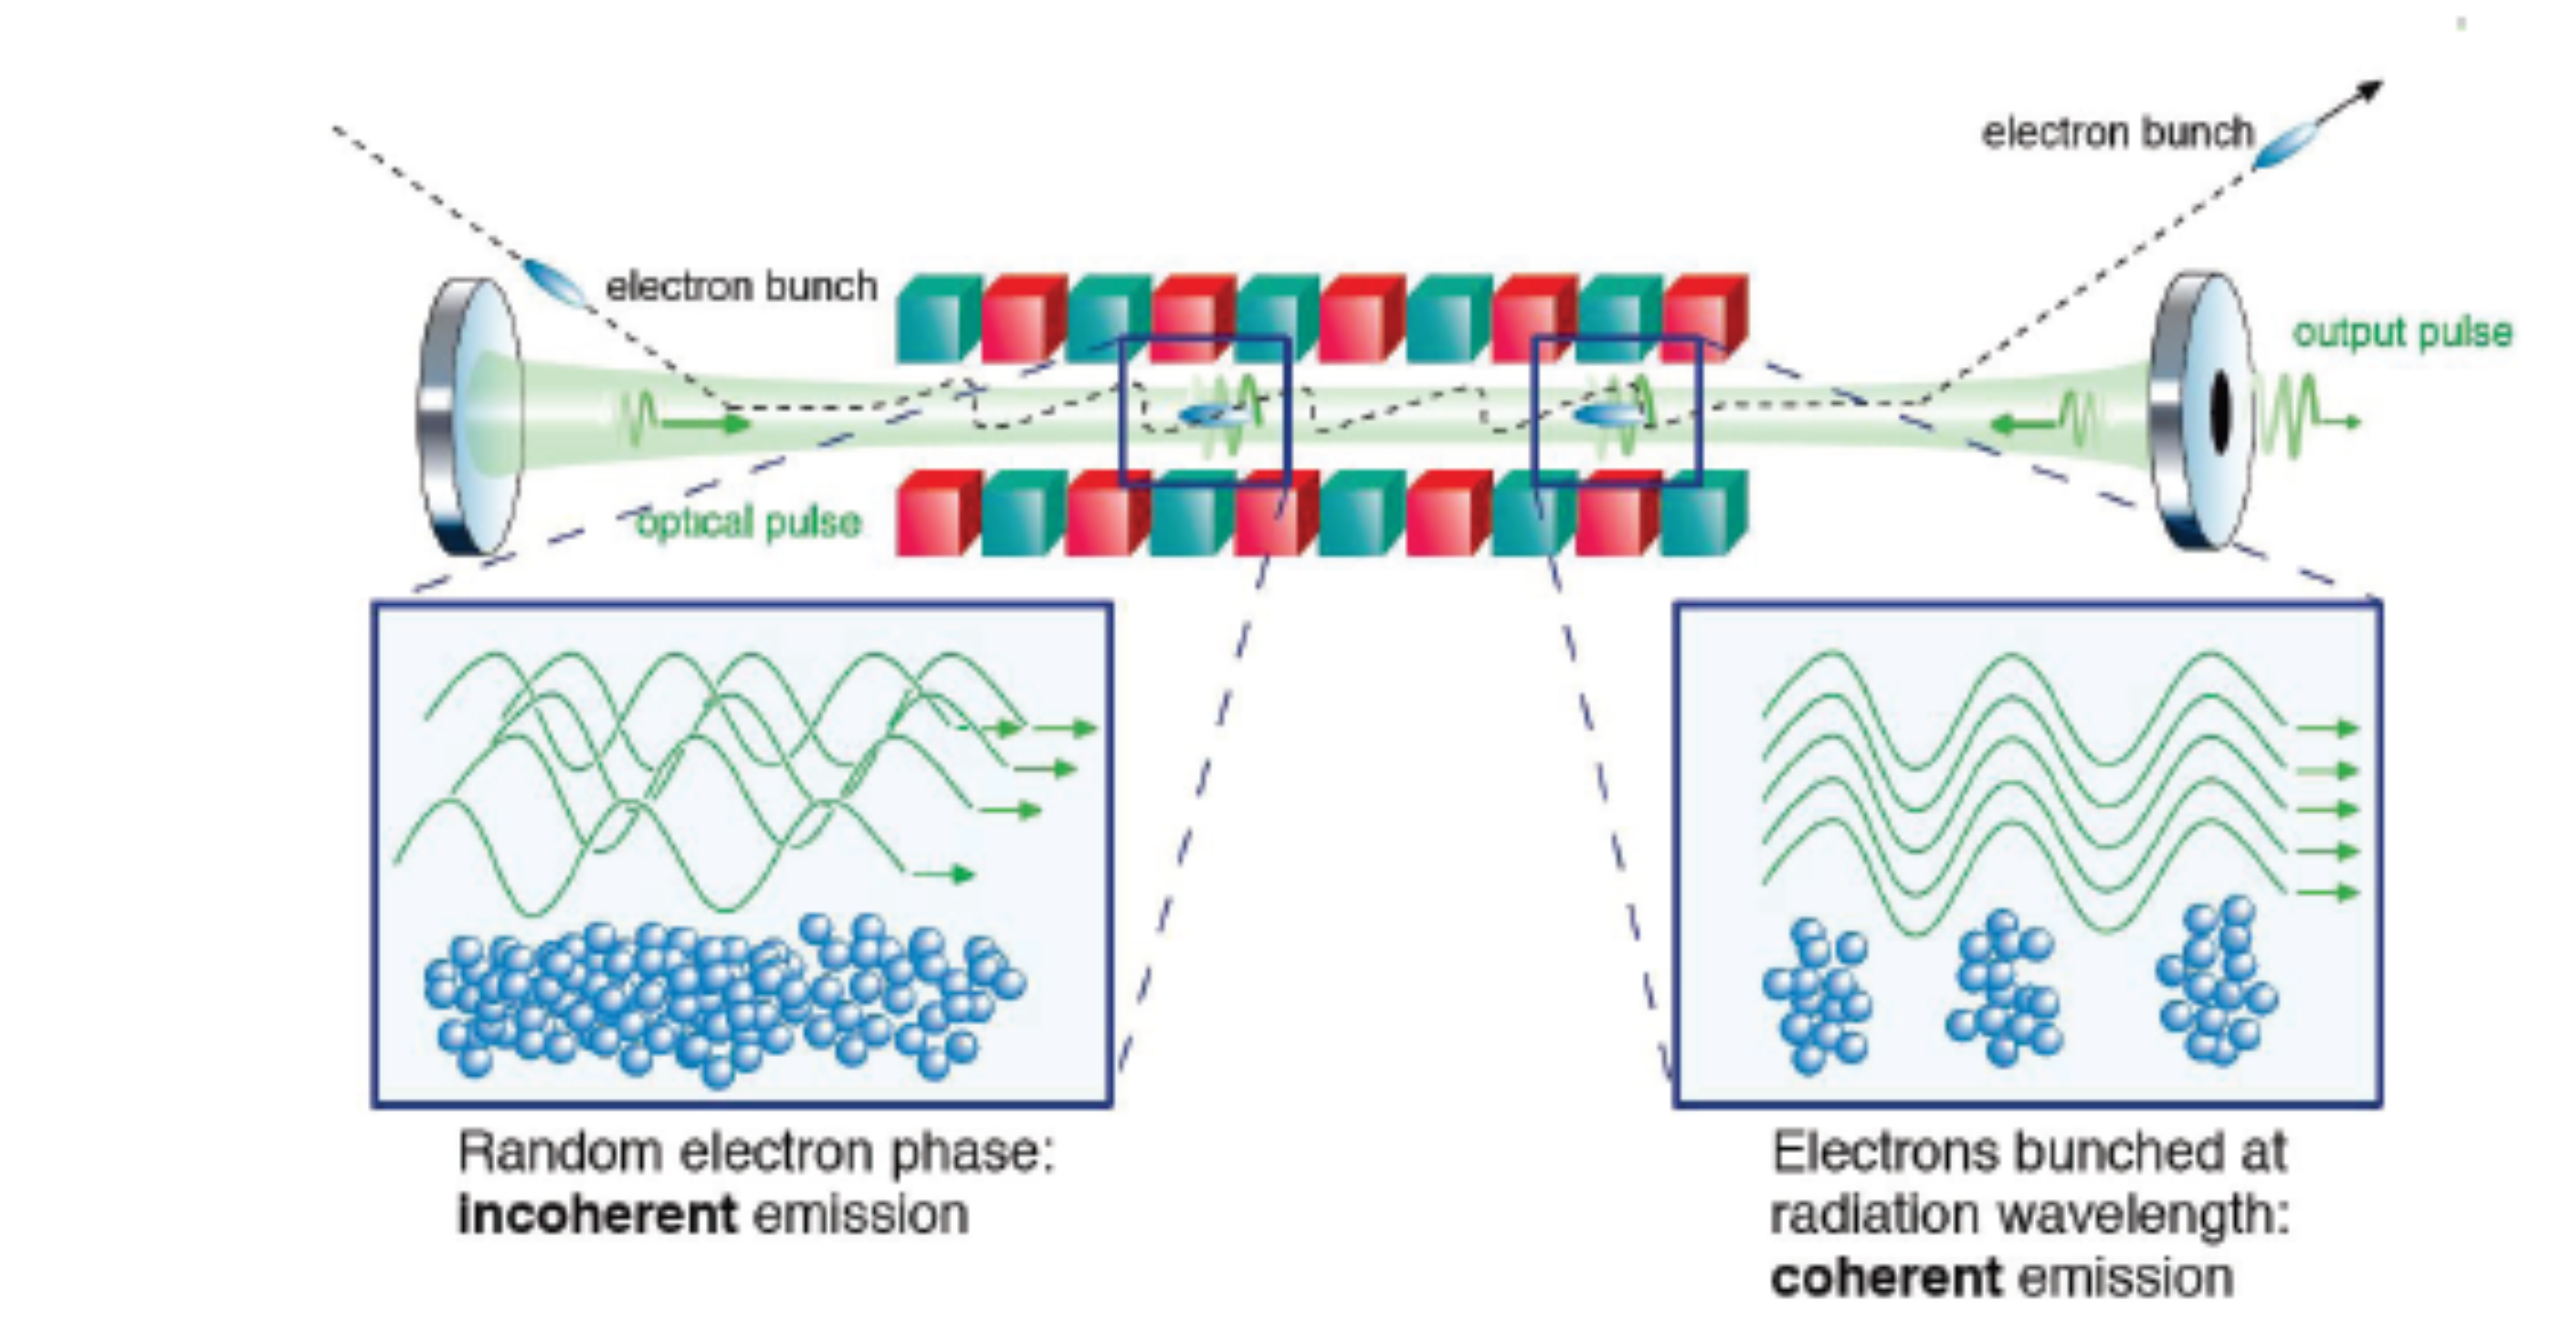 Elektronen clusters